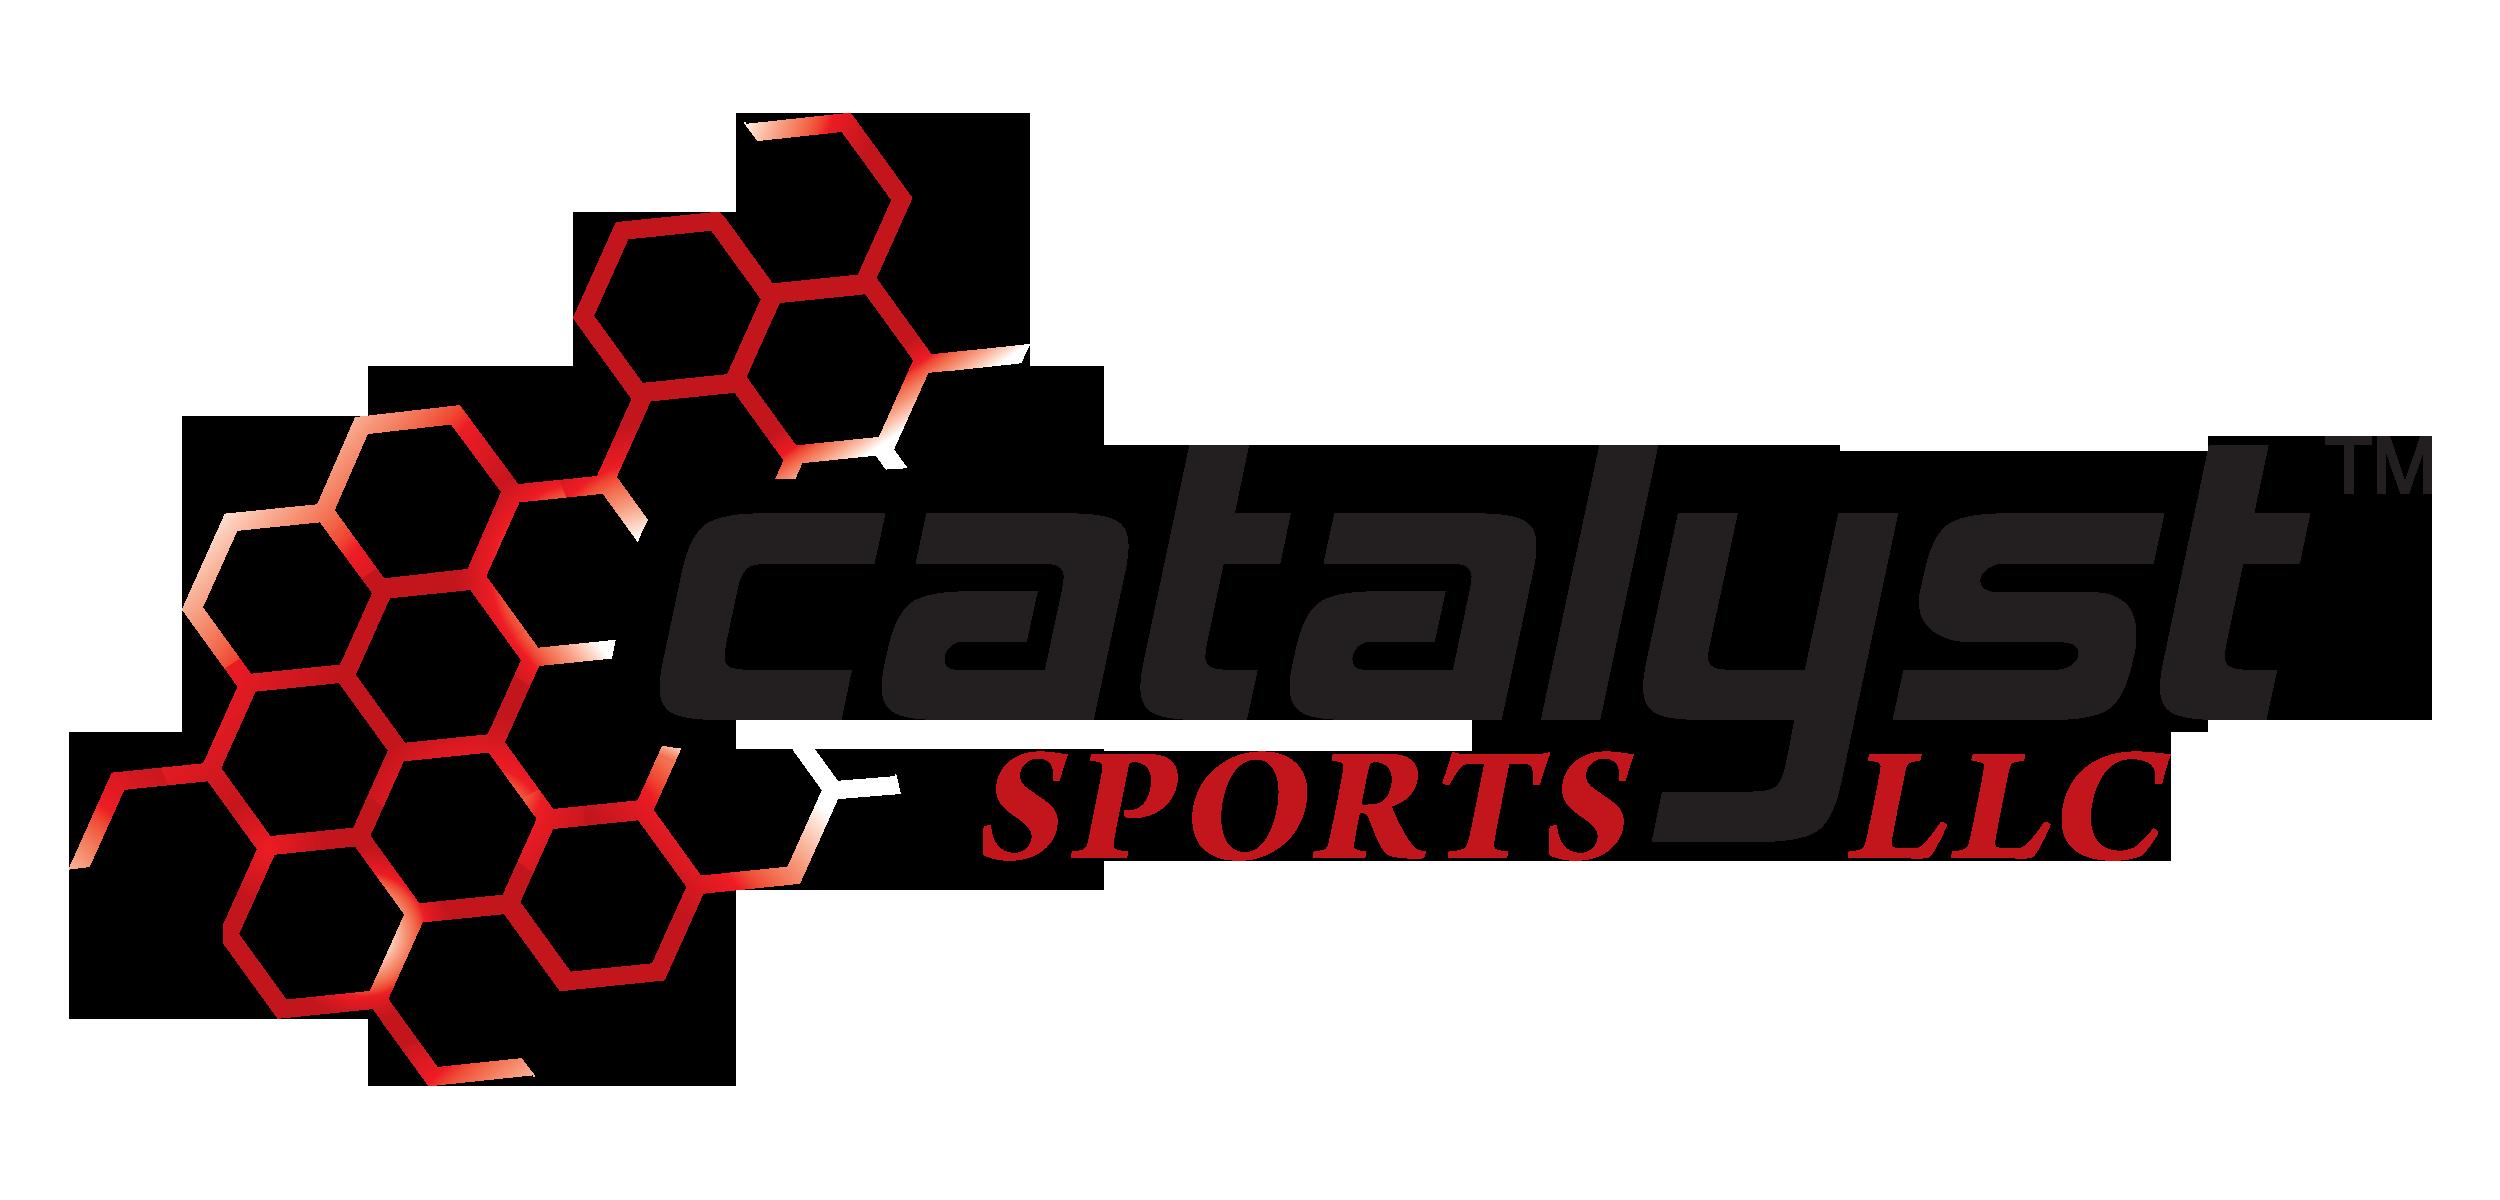 Youth Baseball Teams | Catalyst Sports